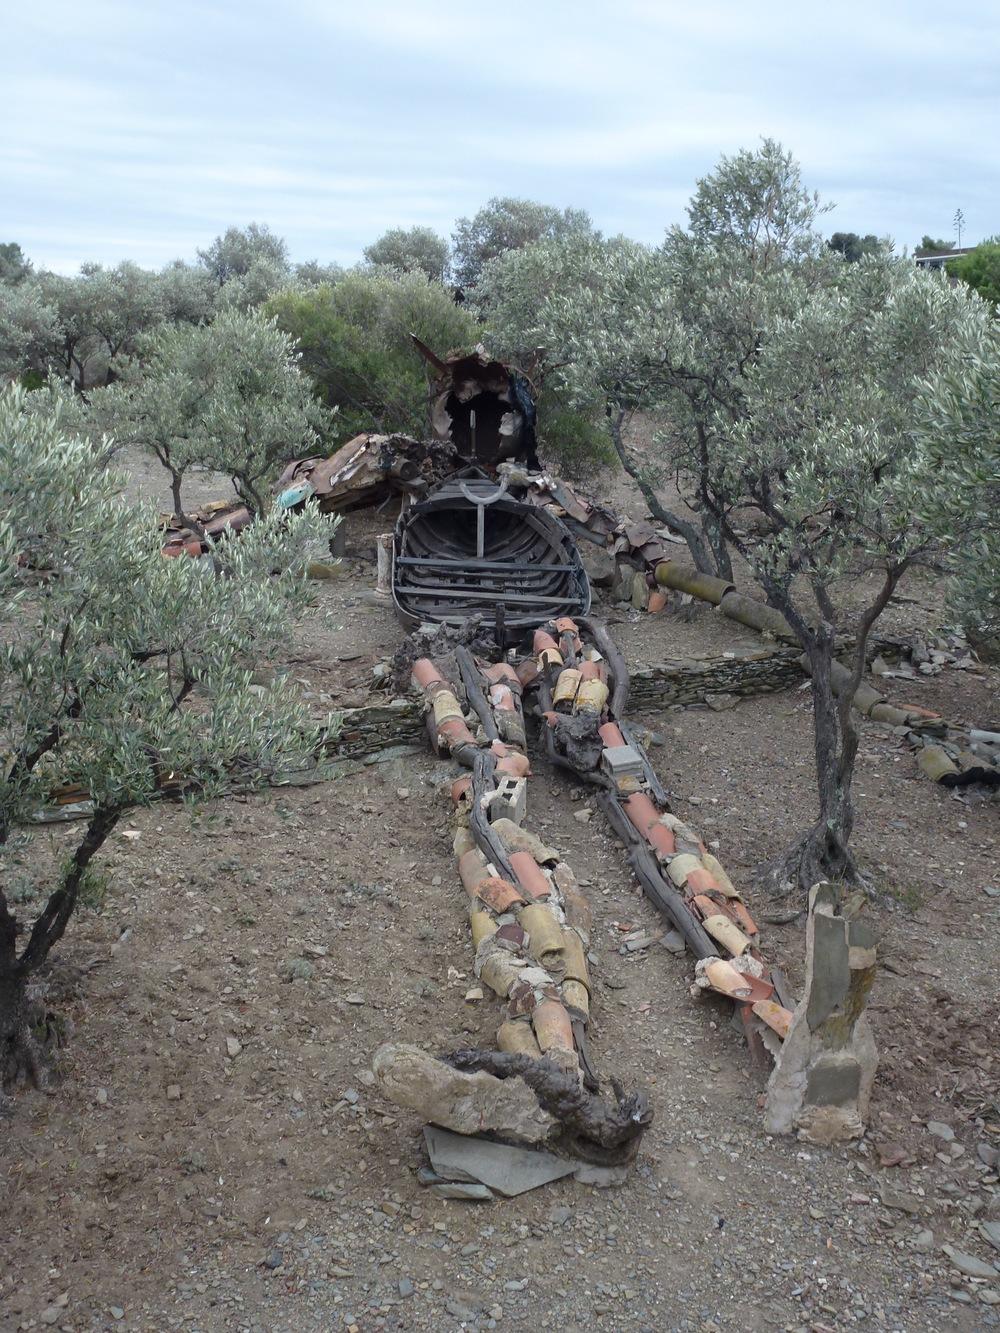 Salvador Dali's backyard